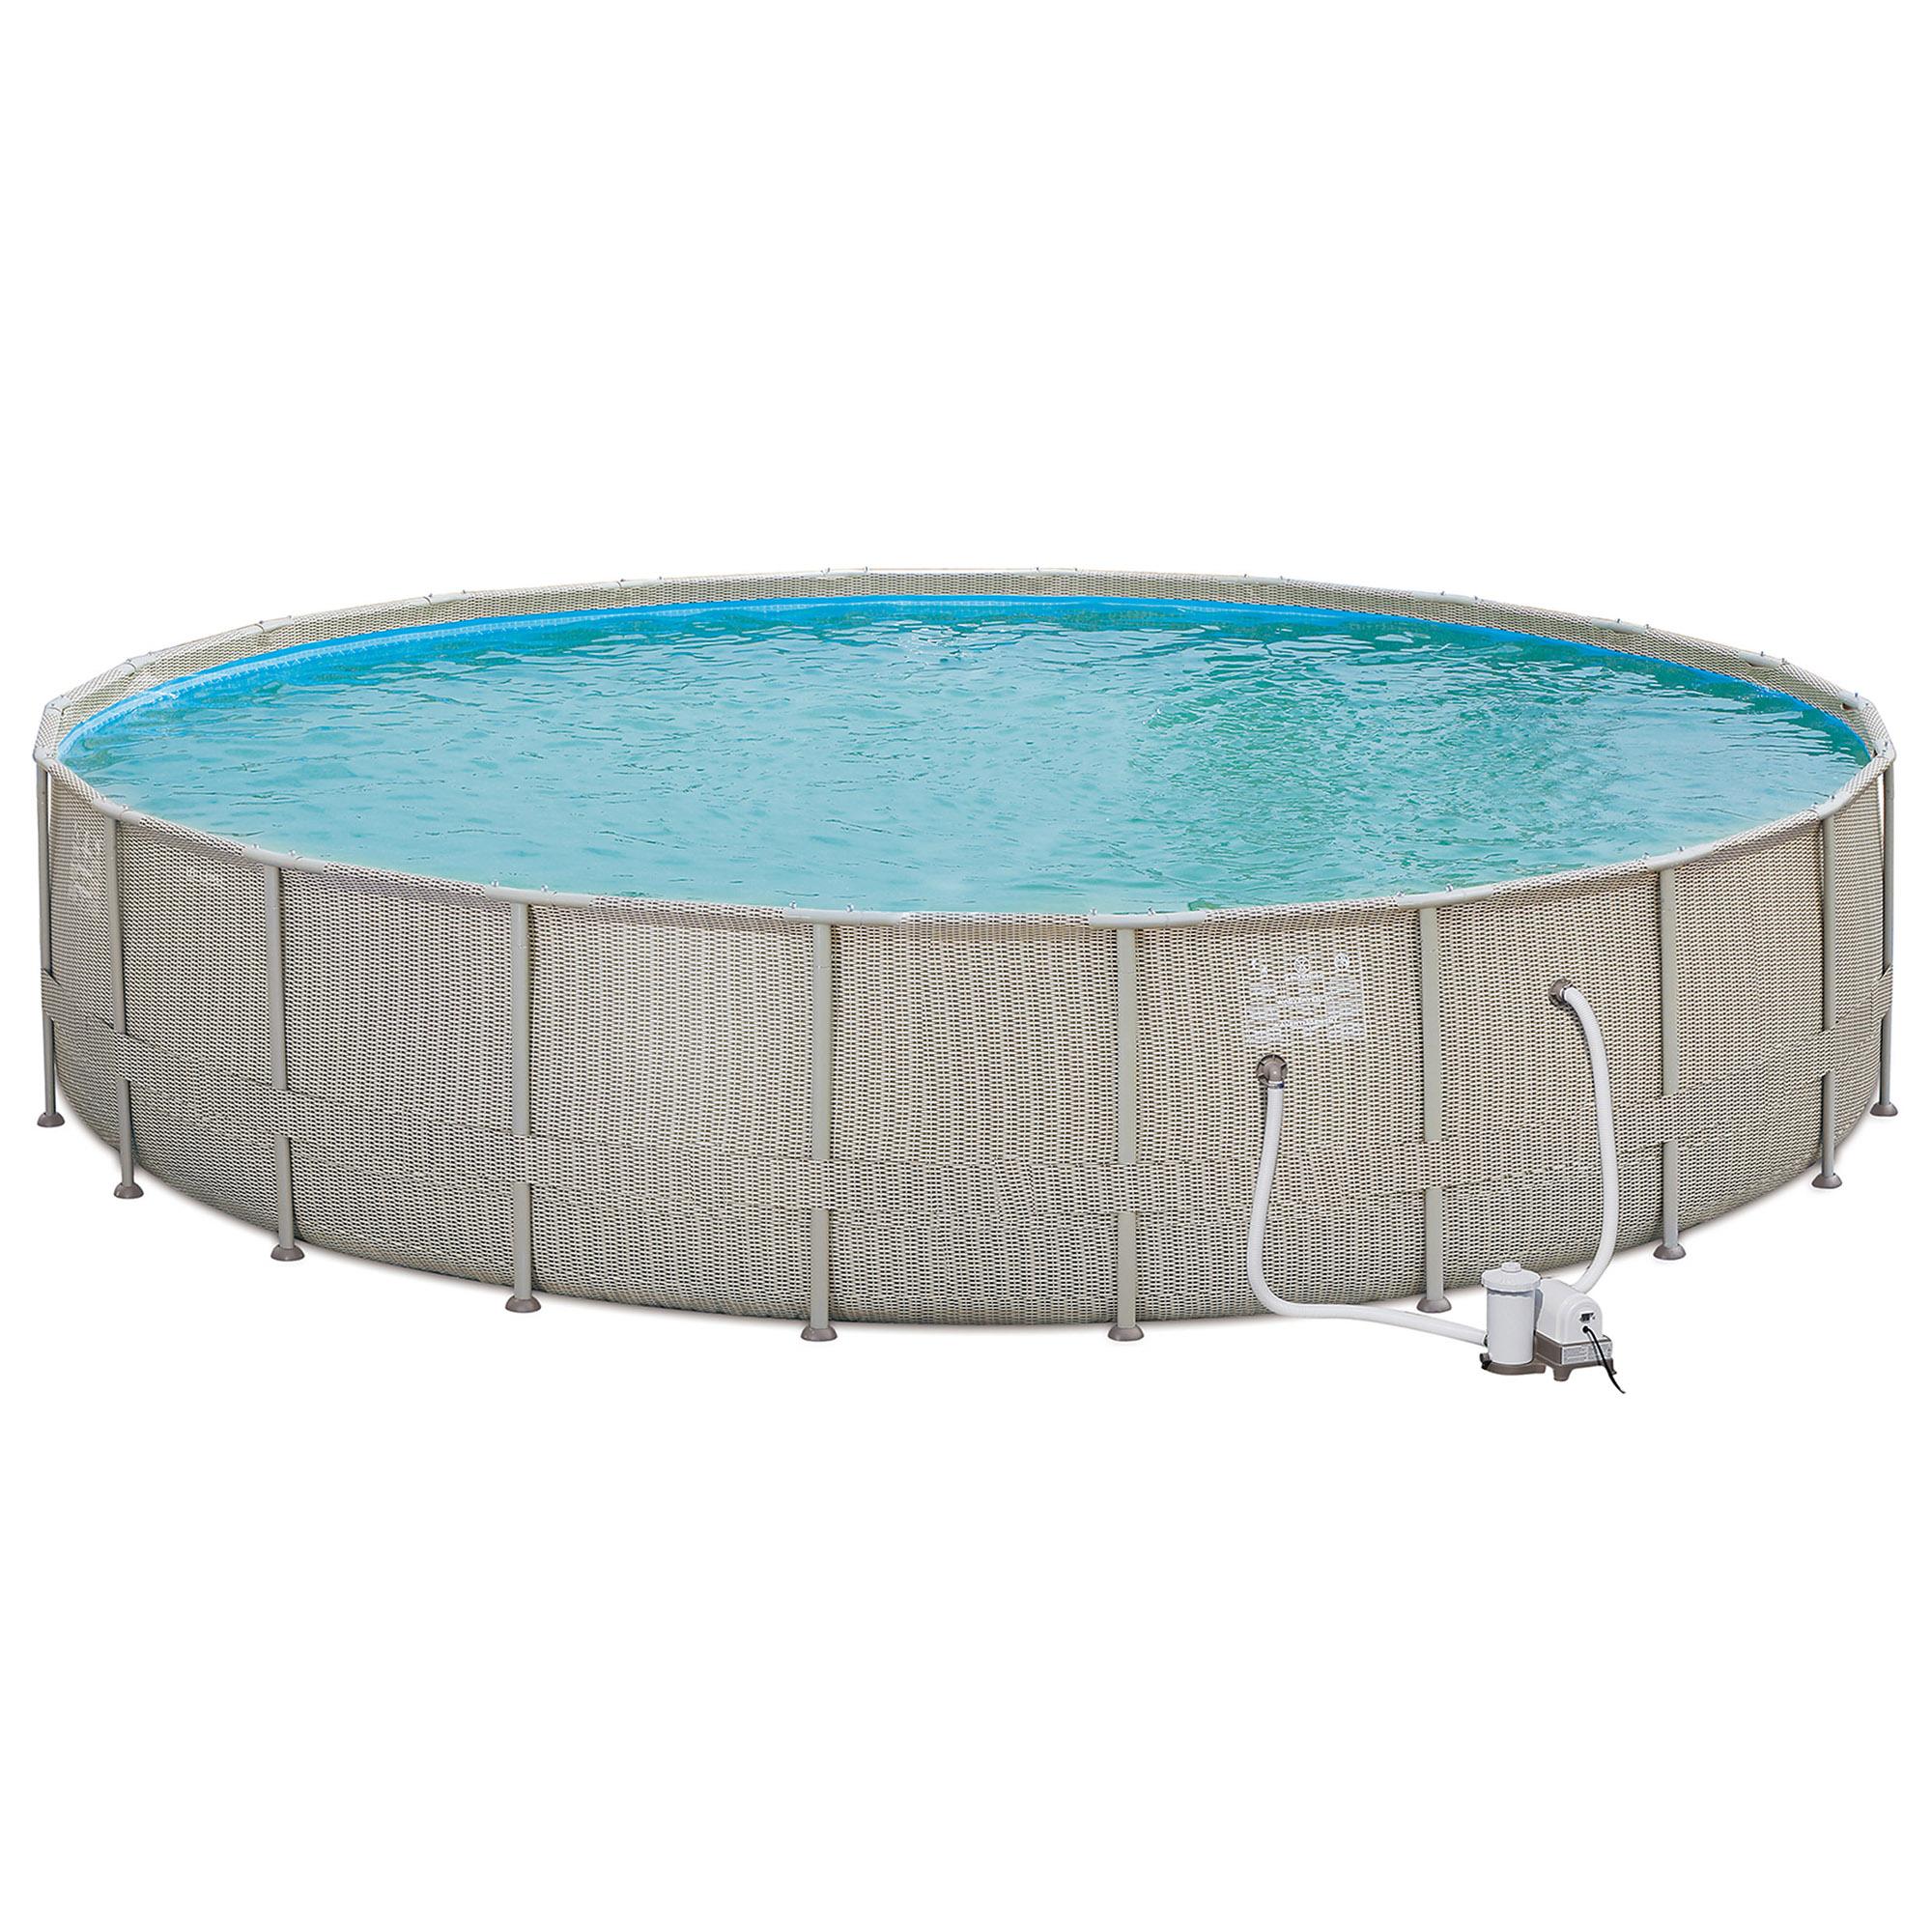 "Summer Waves 22' x 48"" Elite Frame Wicker Print Above Ground Swimming Pool Set"